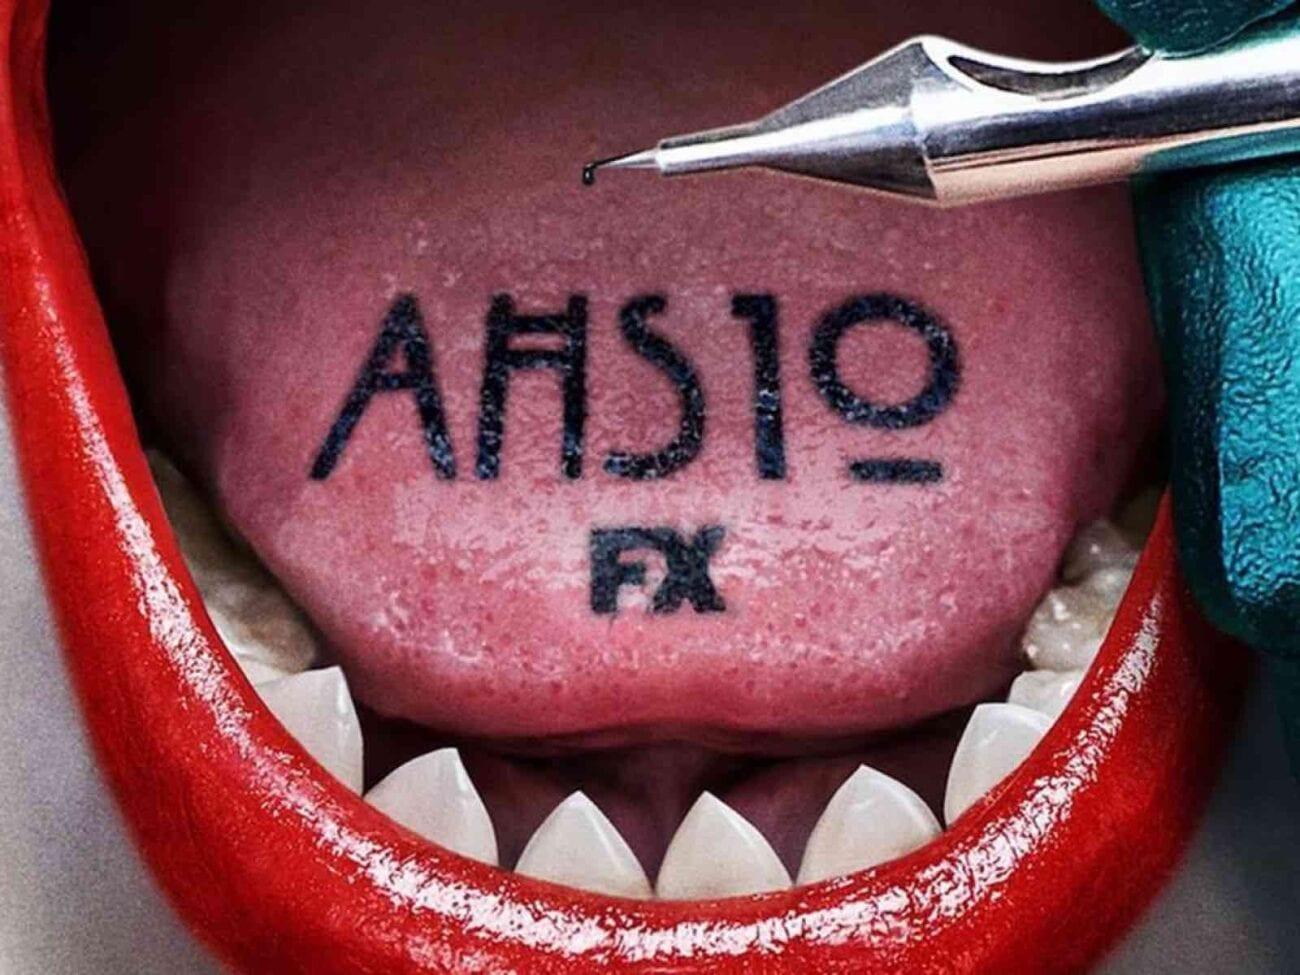 Ryan Murphy's anthology series 'American Horror Story' has been running for nine seasons. Watch these scenes before season 10 arrives.